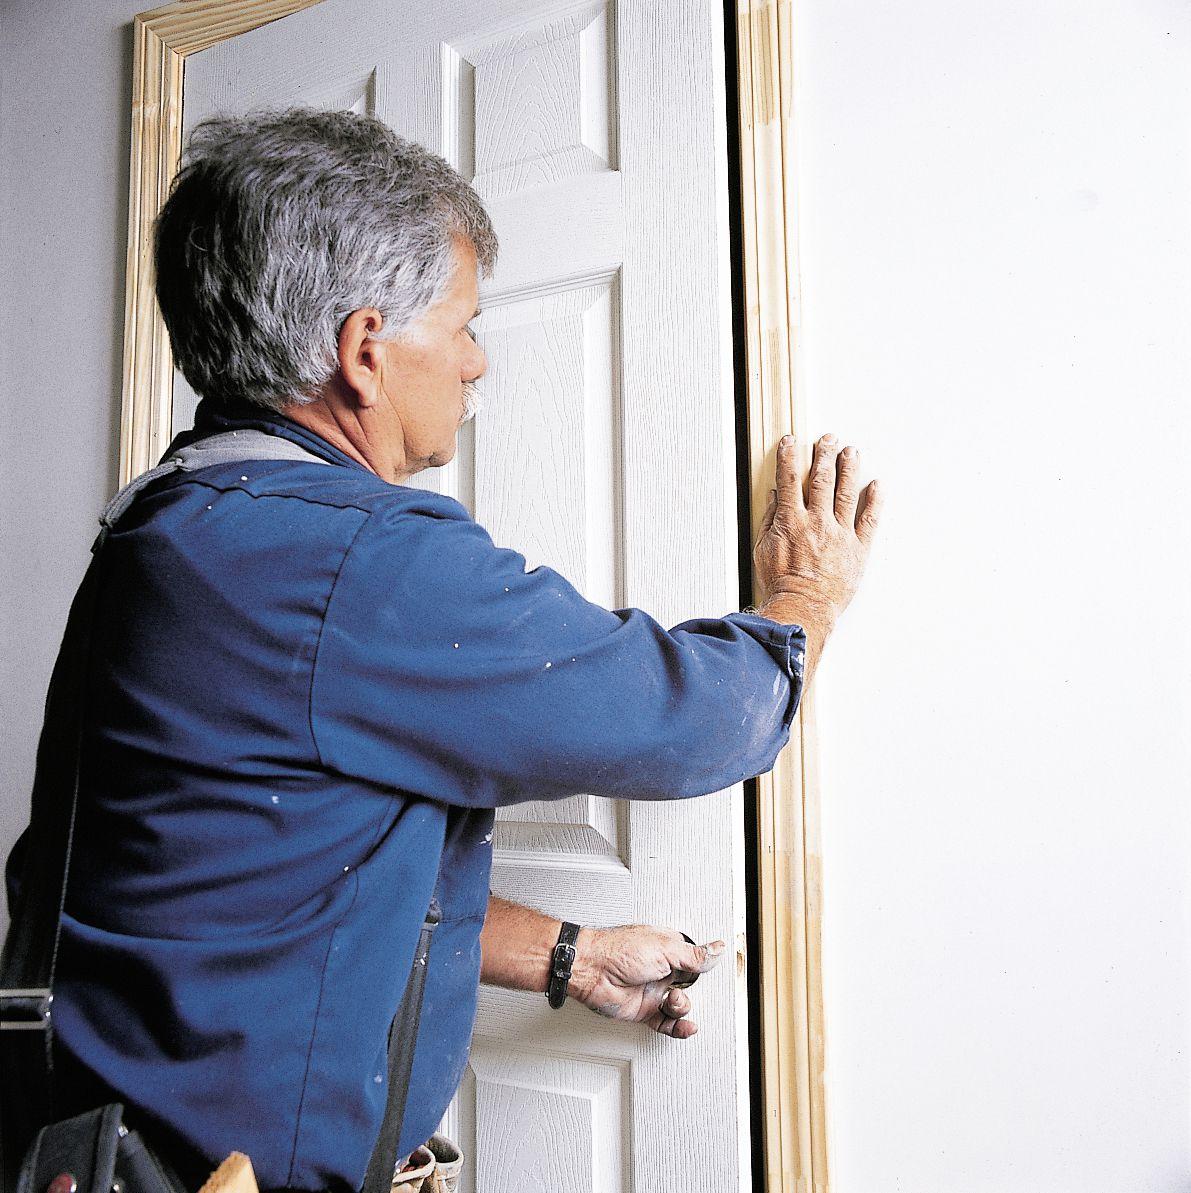 Man Checks Horizontal Gap Or Reveal Of Doorway